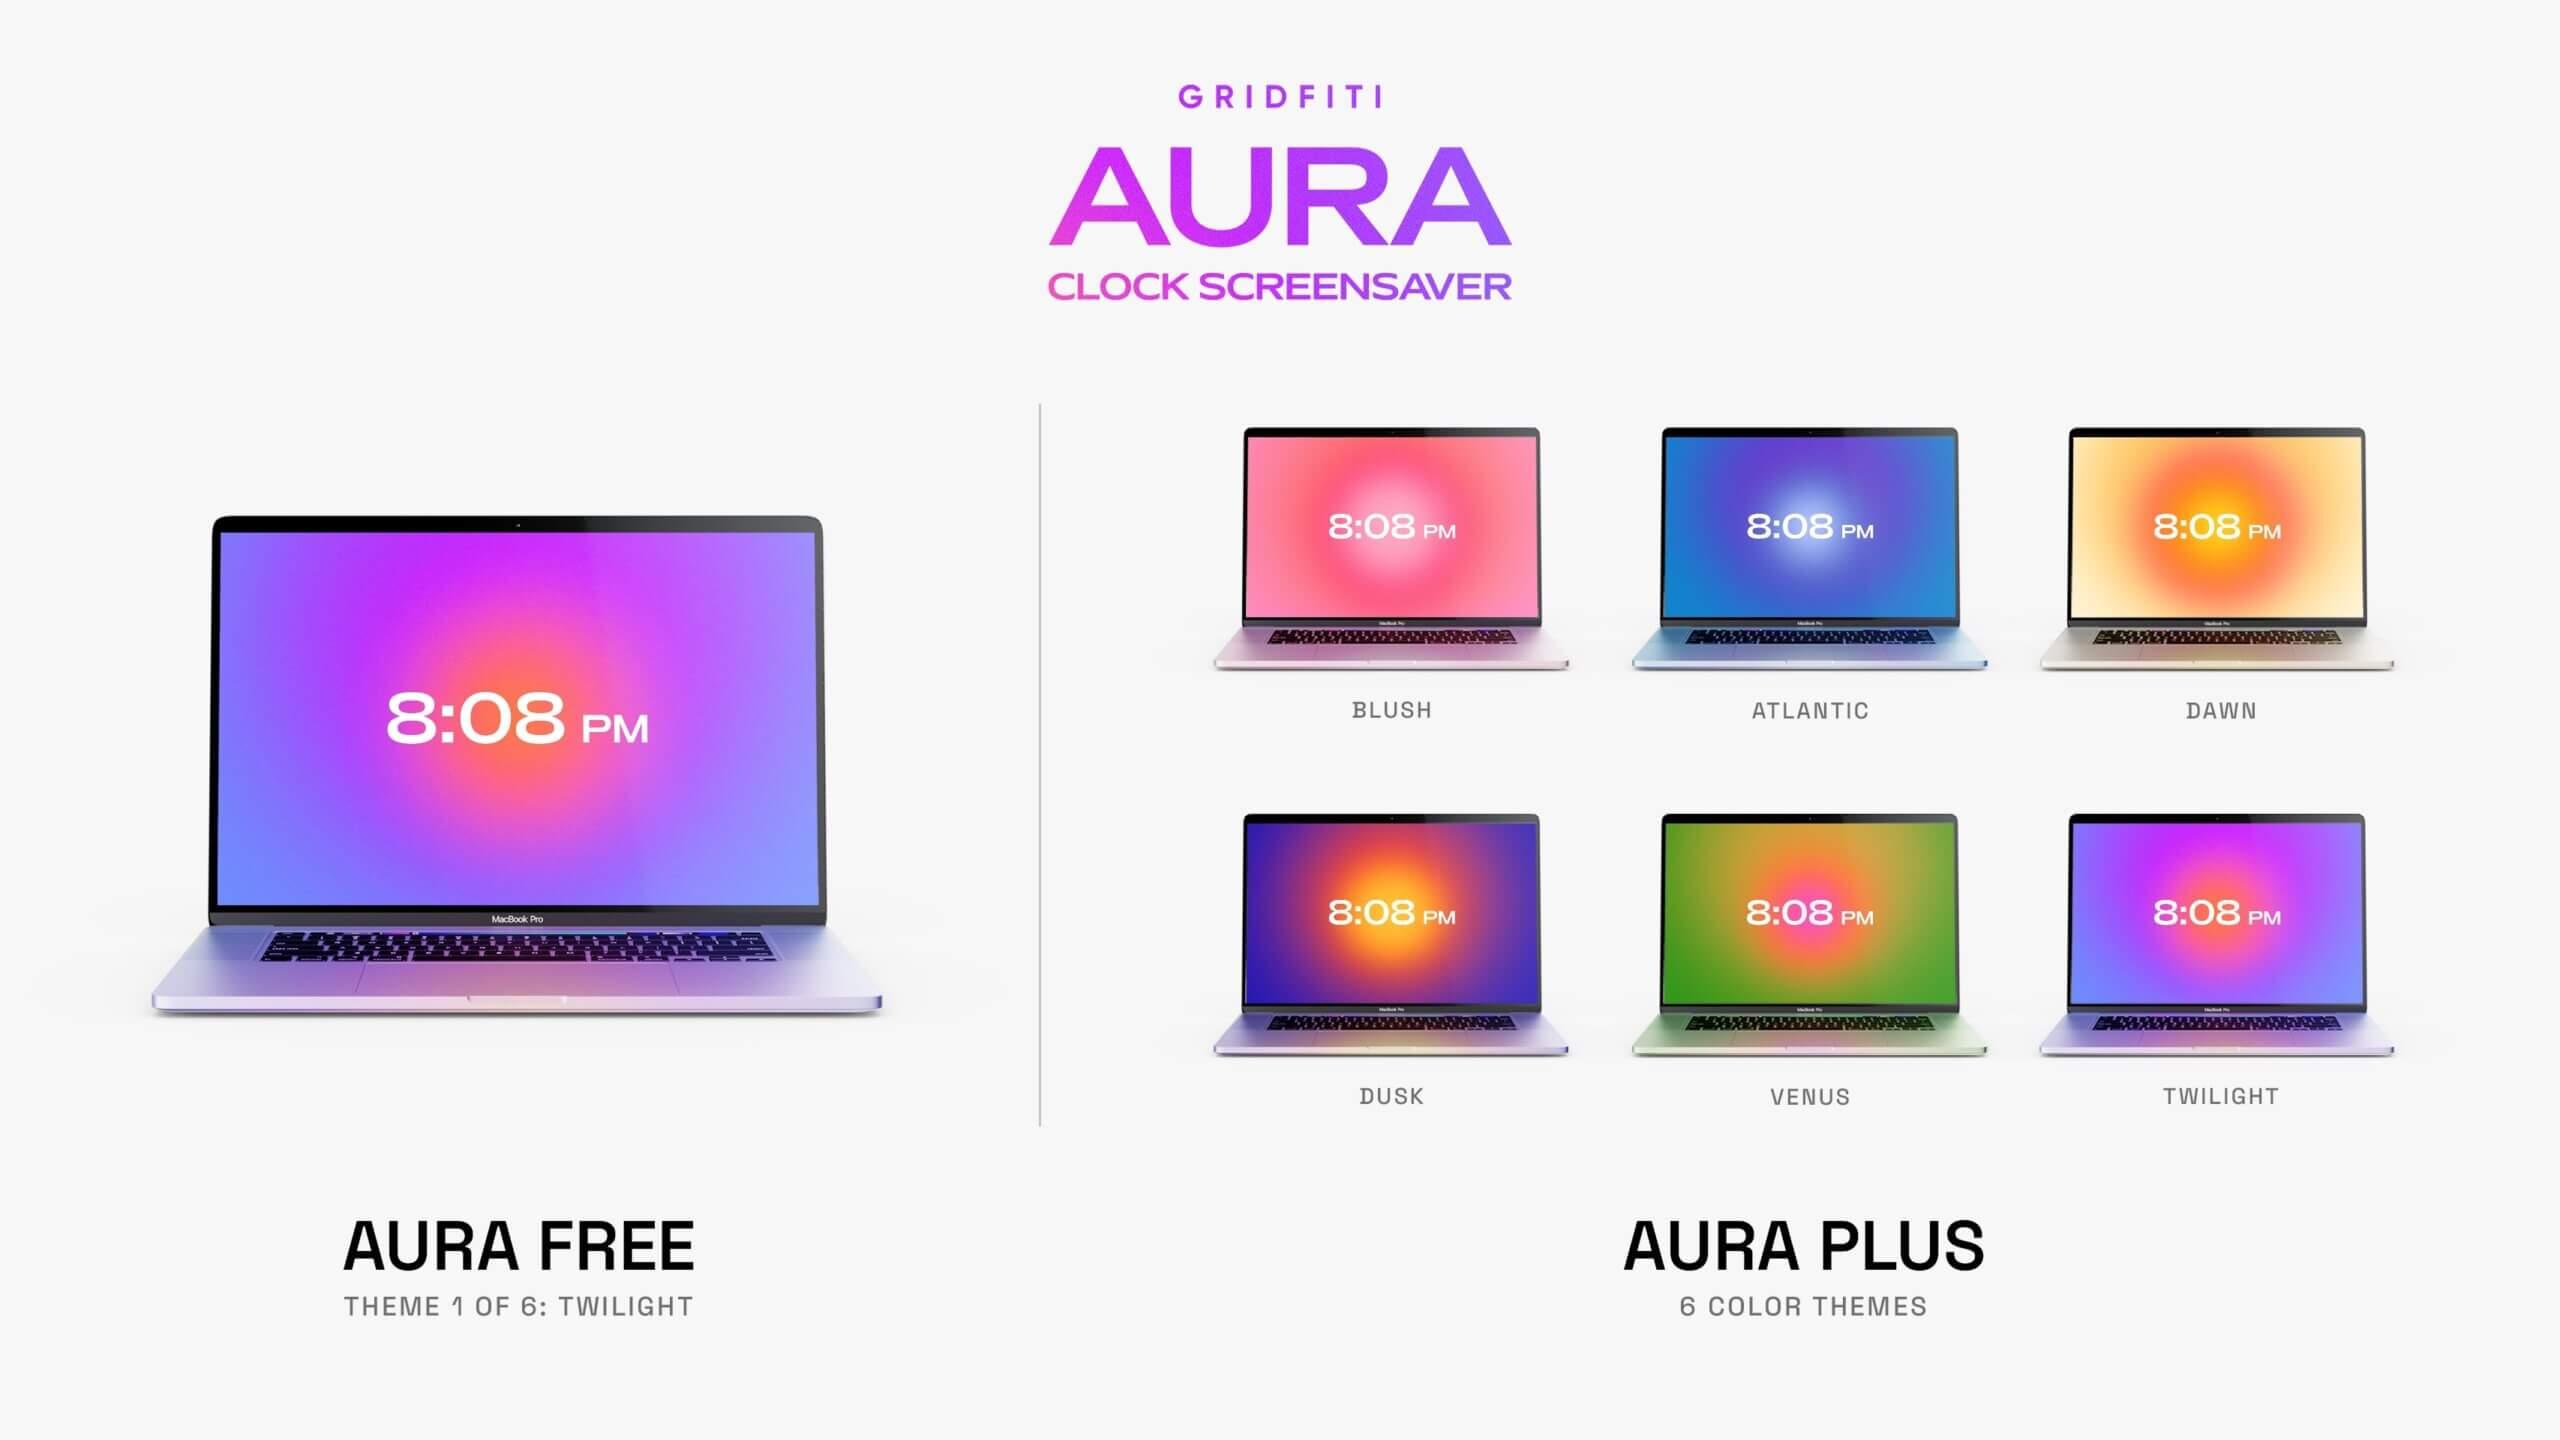 Aura Clock Screensaver